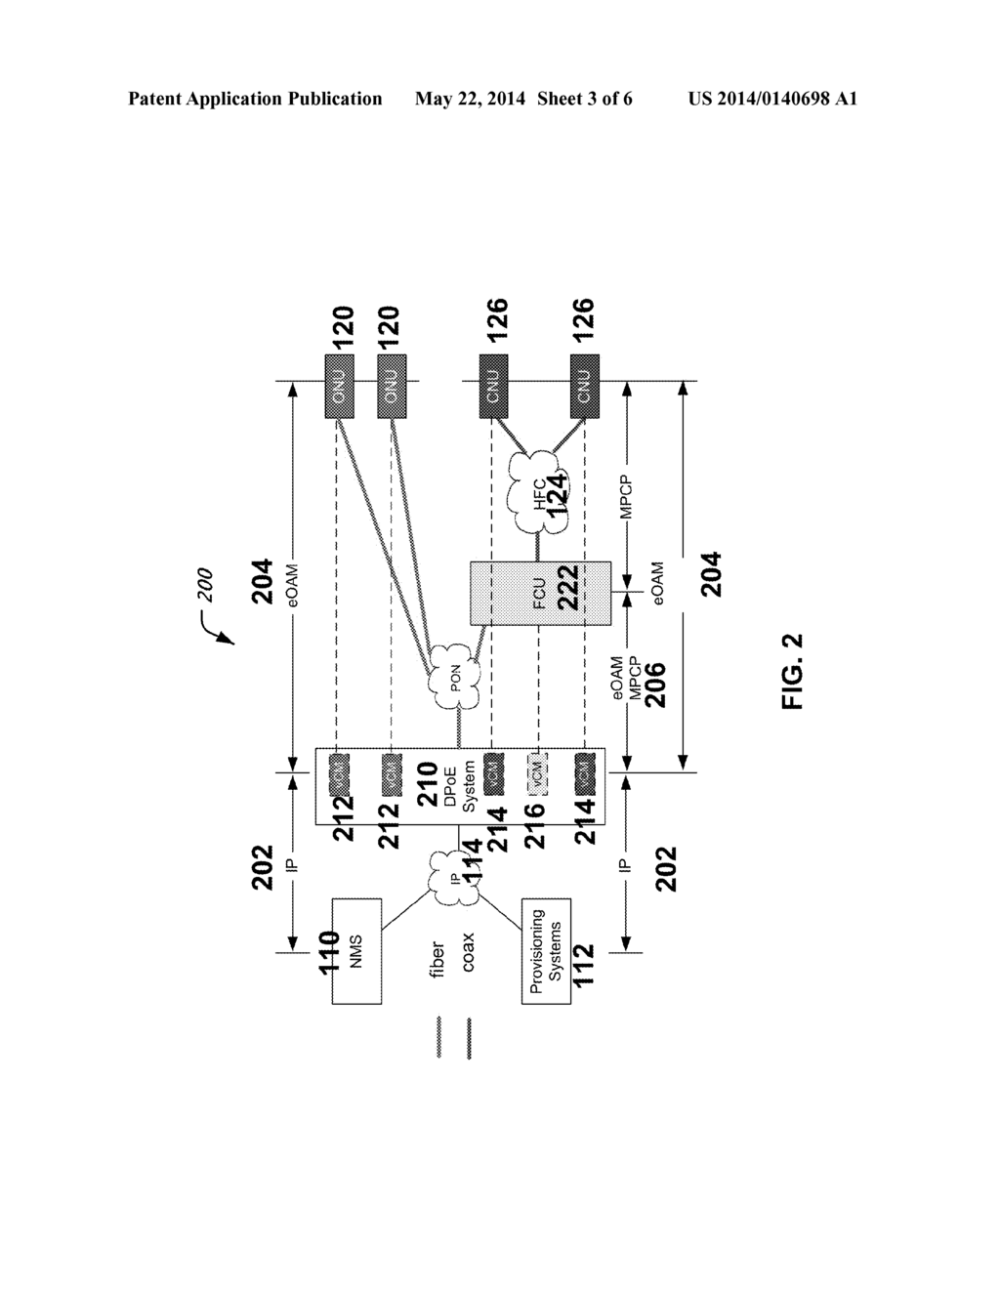 medium resolution of fiber coax unit fcu architecture for ethernet passive optical network epon protocol over coax epoc diagram schematic and image 04